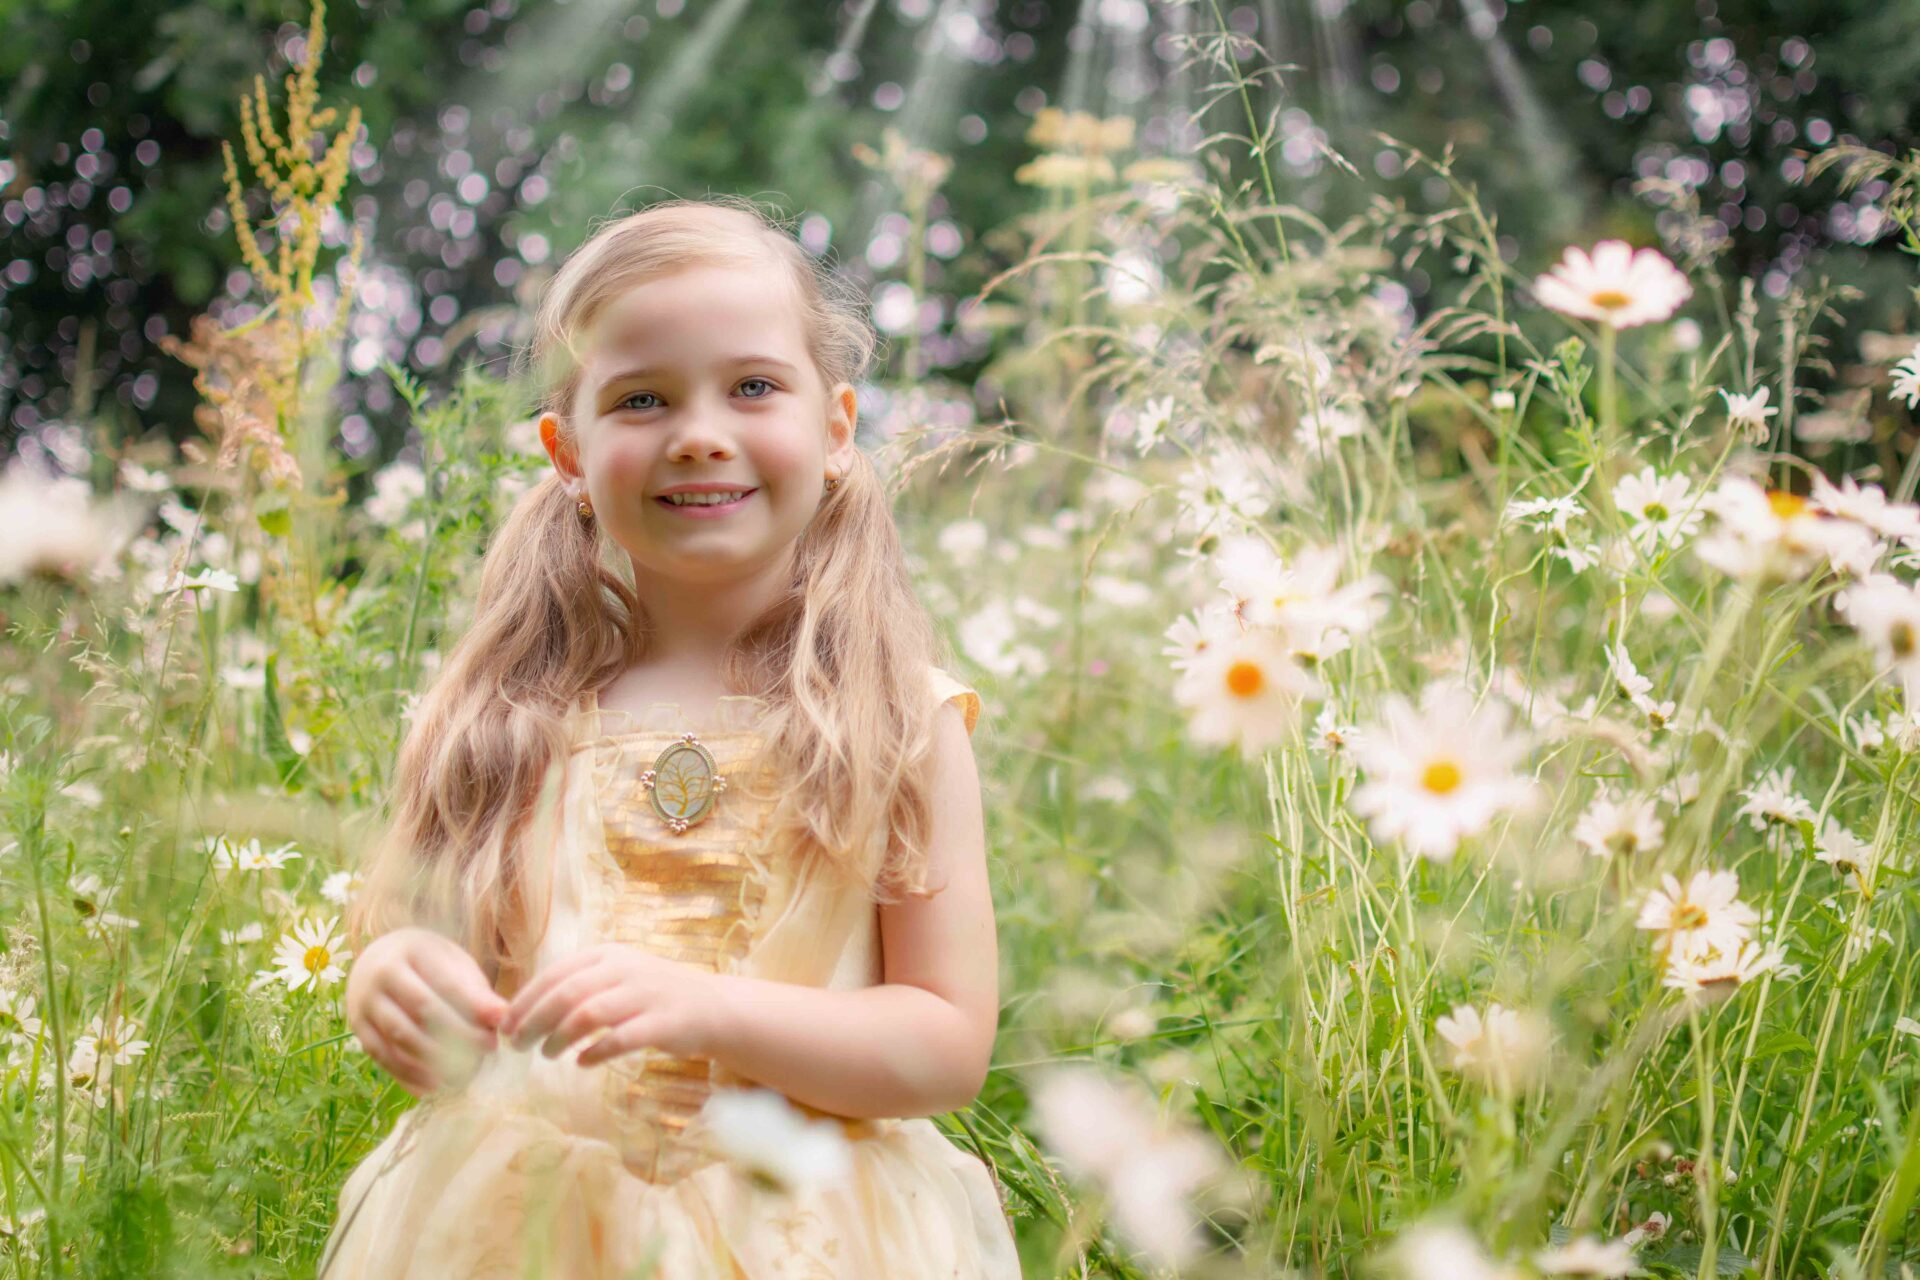 fairytale-photography-in-burton-on-trent-staffordshire